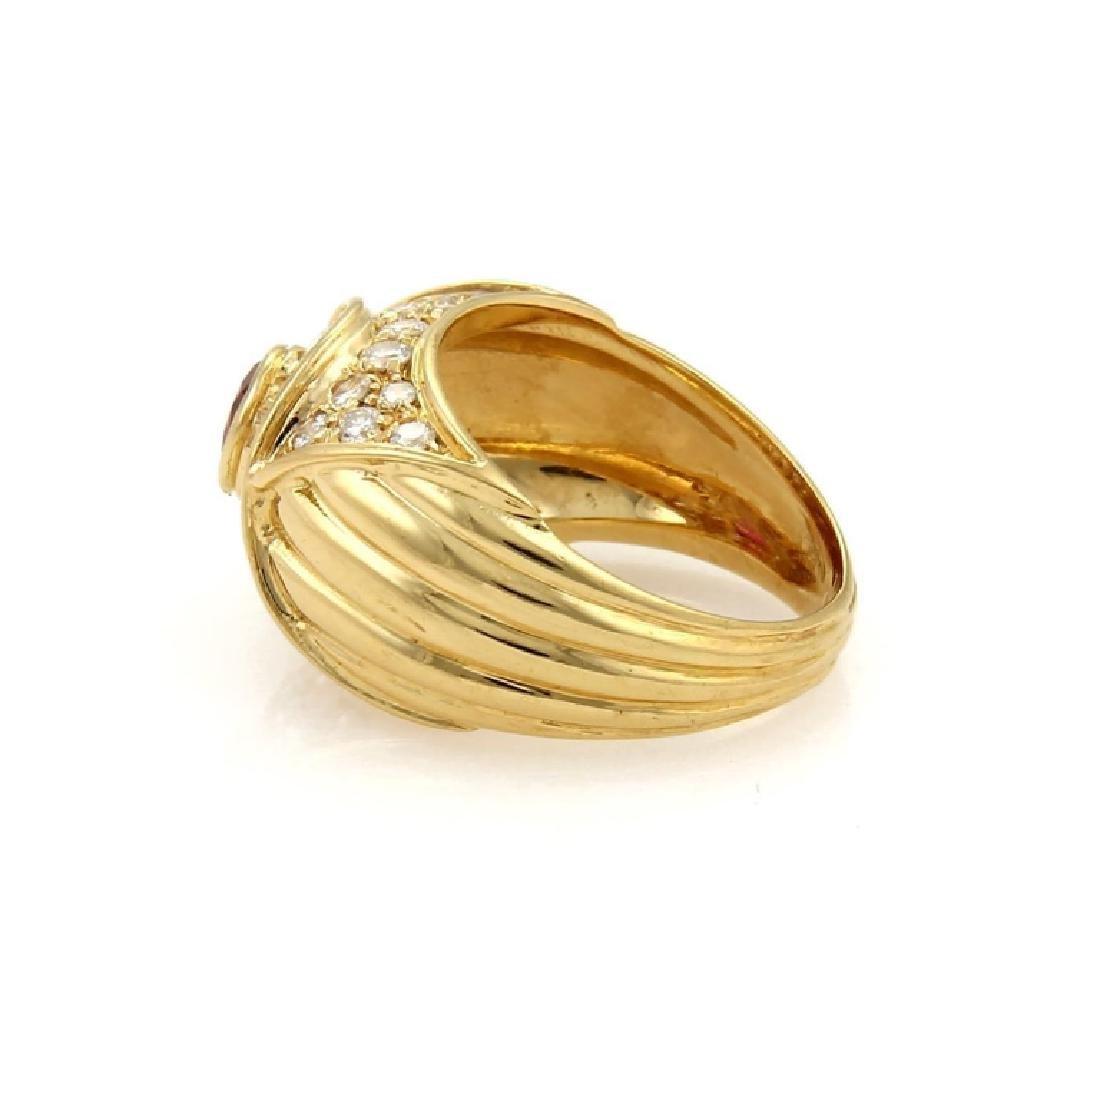 Piaget Diamond Ruby 18k Yellow Gold Dome Band - 2